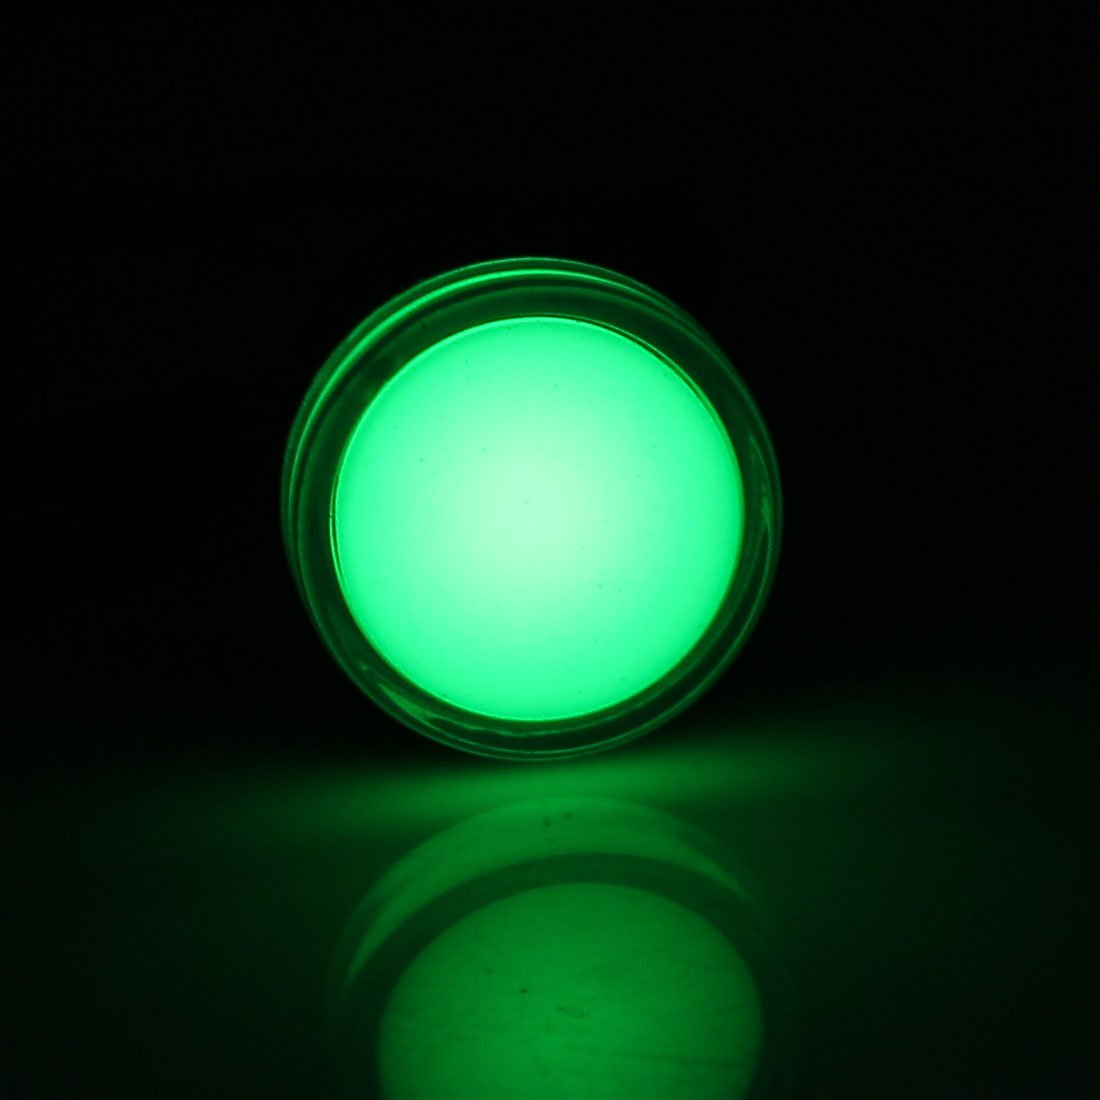 uxcell a15110200ux0132 AC//DC 110V Green LED Indicator Light Pilot Signal Lamp AD16-22DS 4 Pcs